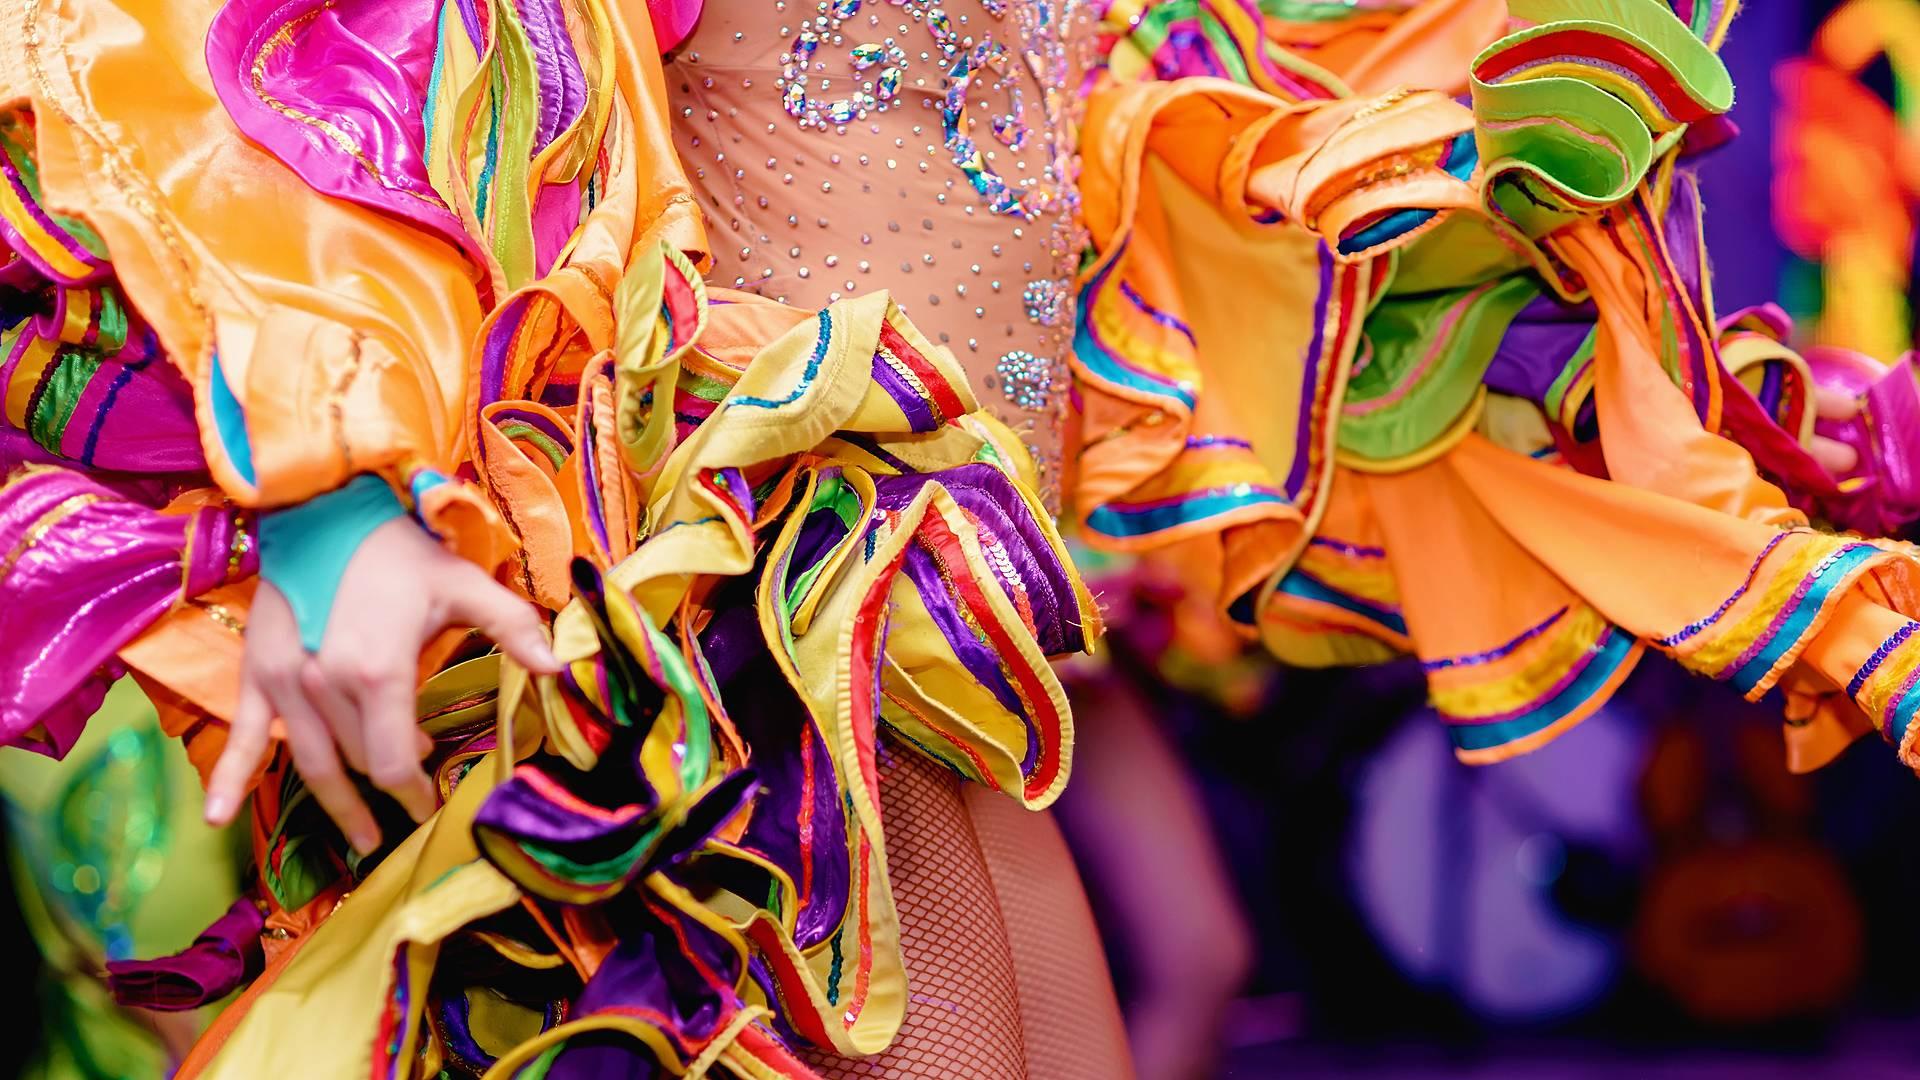 Vive el Carnaval de Brasil